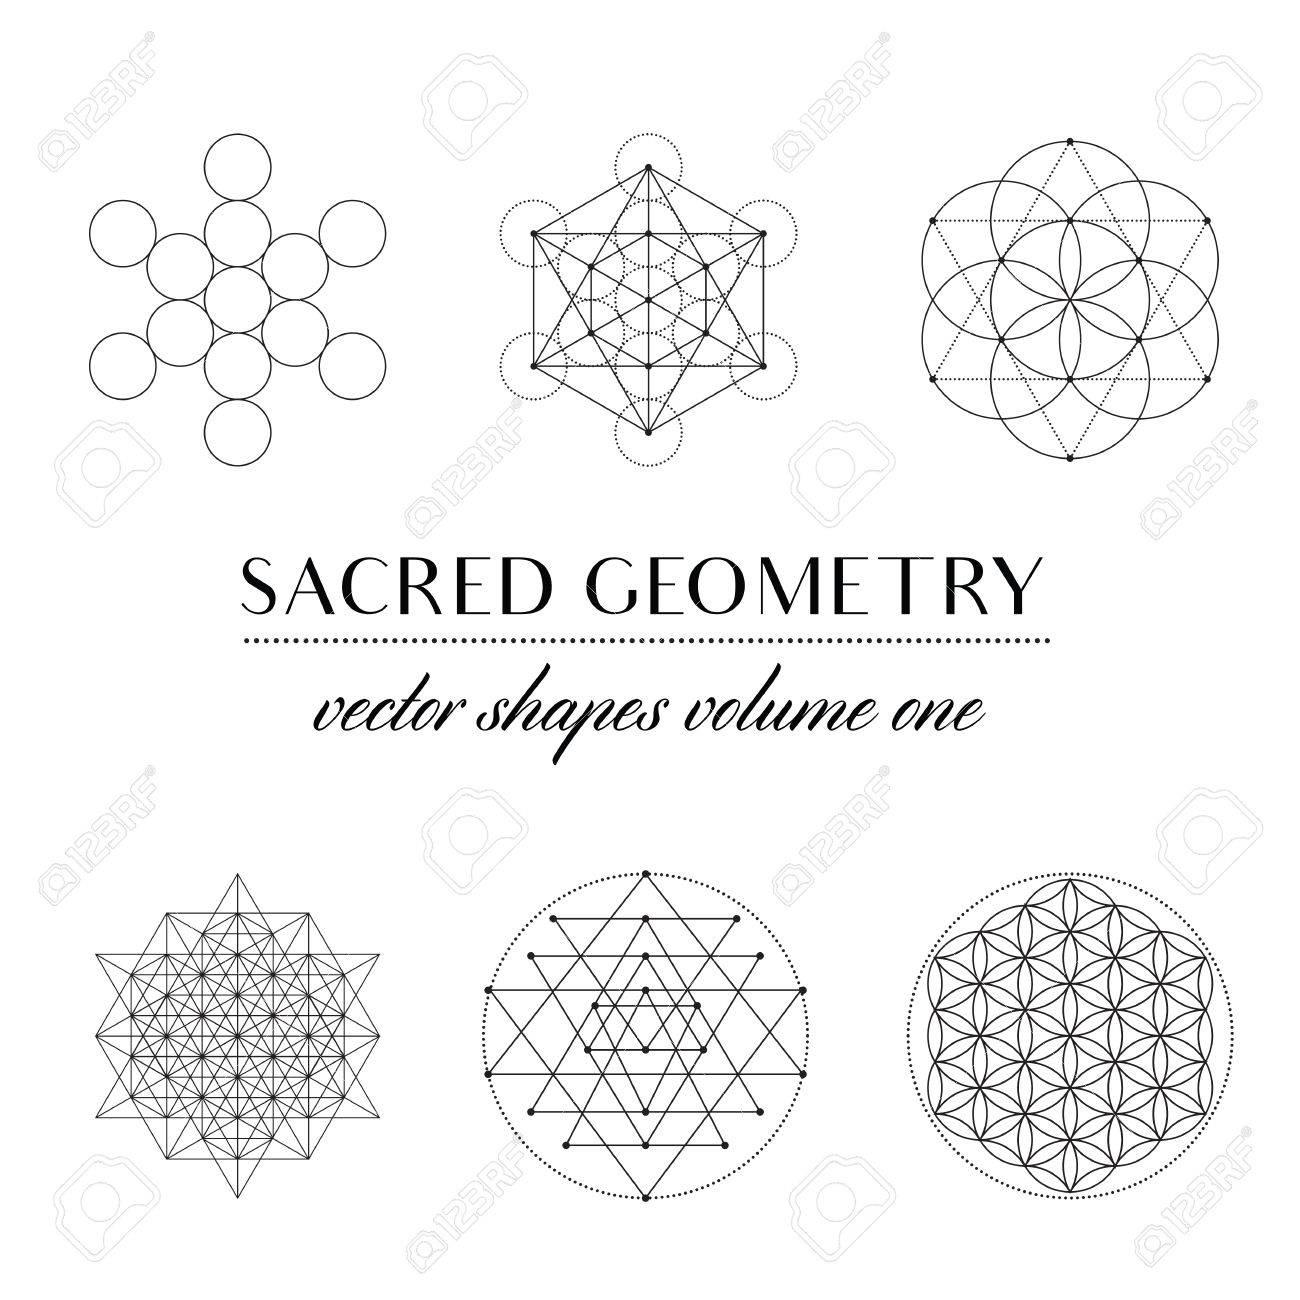 sacred geometry volume one set of sacred geometry art geometric